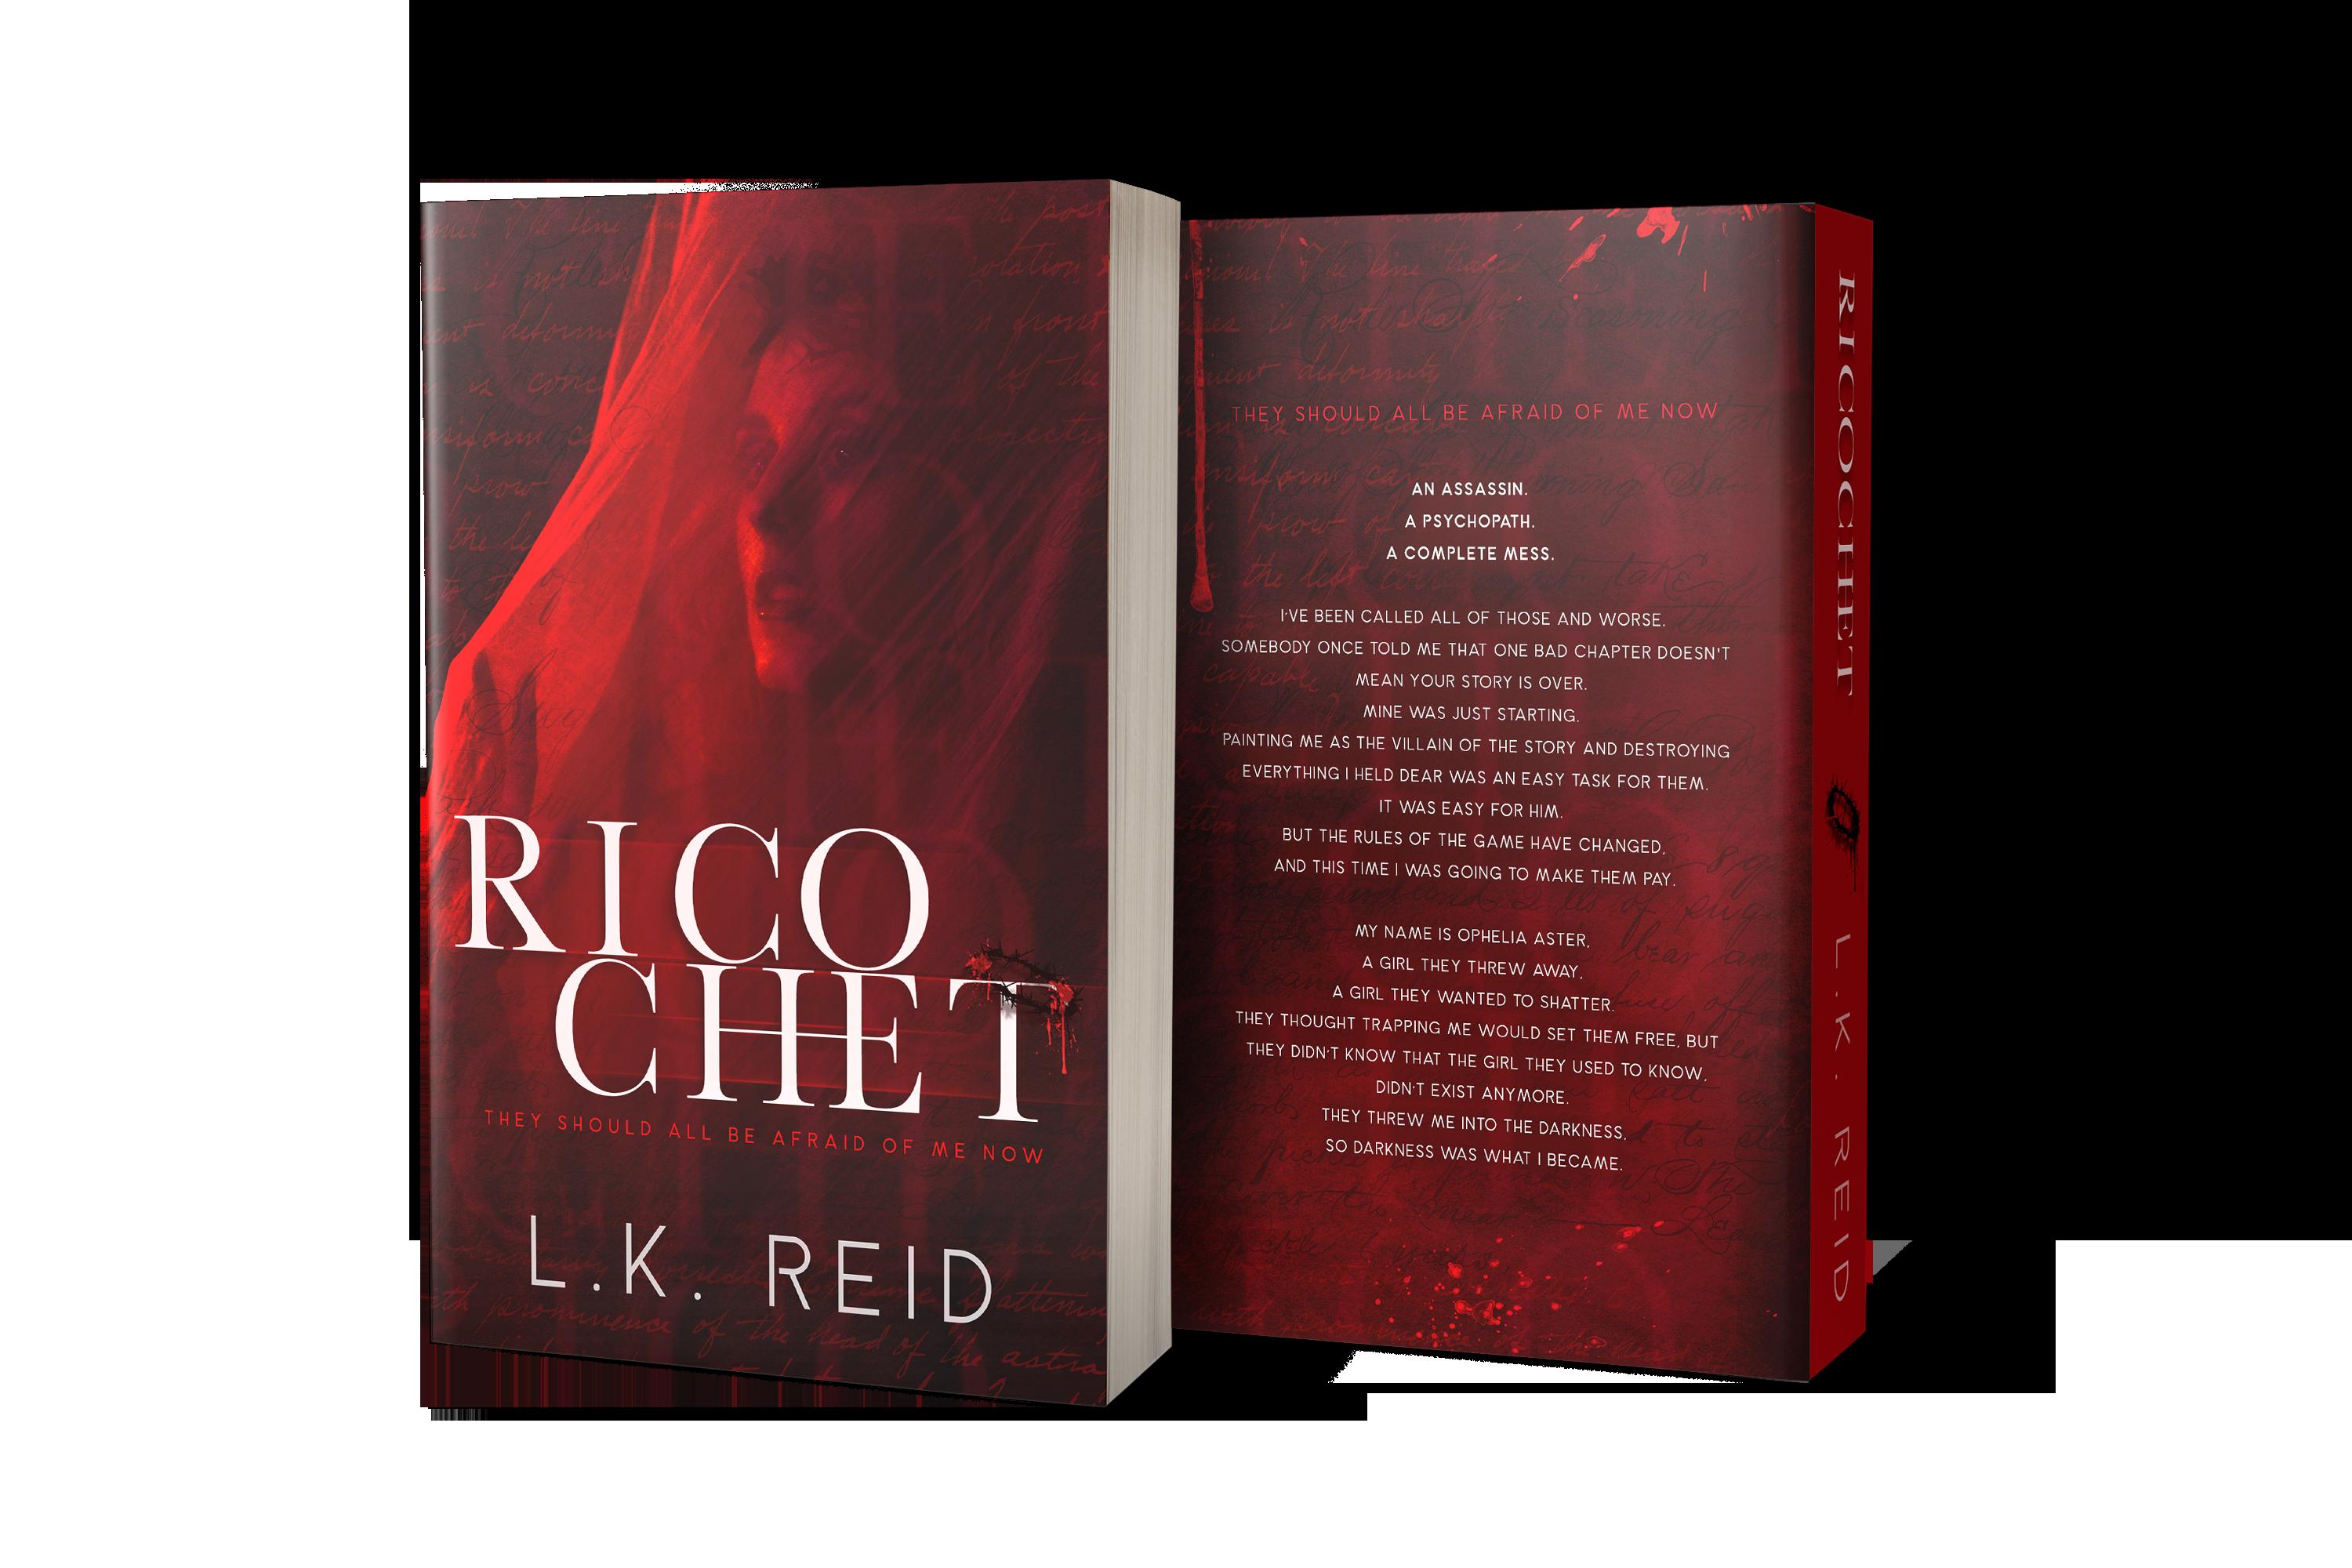 Ricochet - double